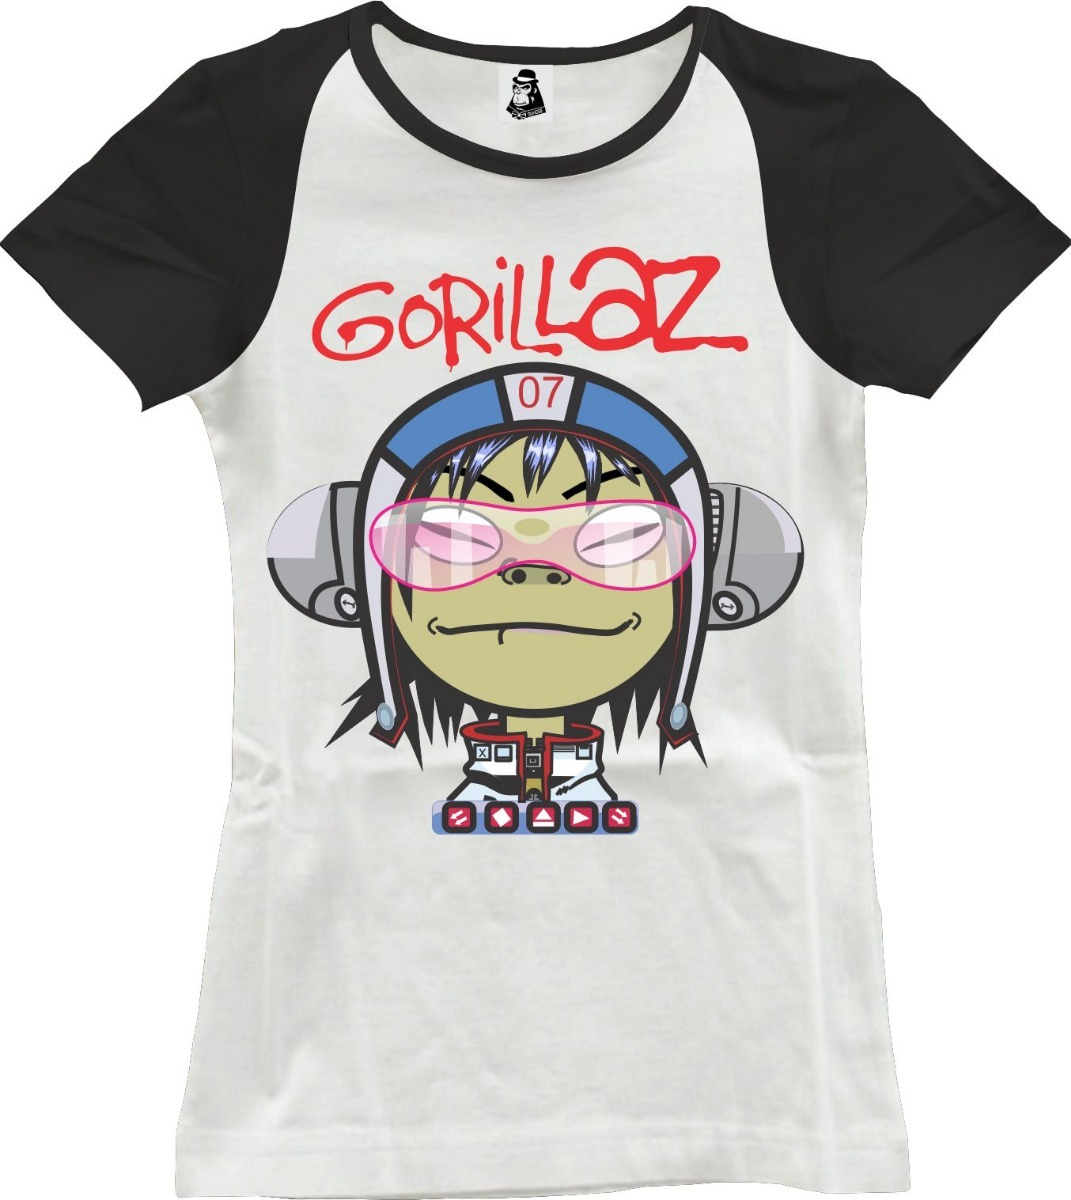 camisa camiseta feminina de rock gorillaz noodle. Carregando zoom. 8dac7d7ec68b4